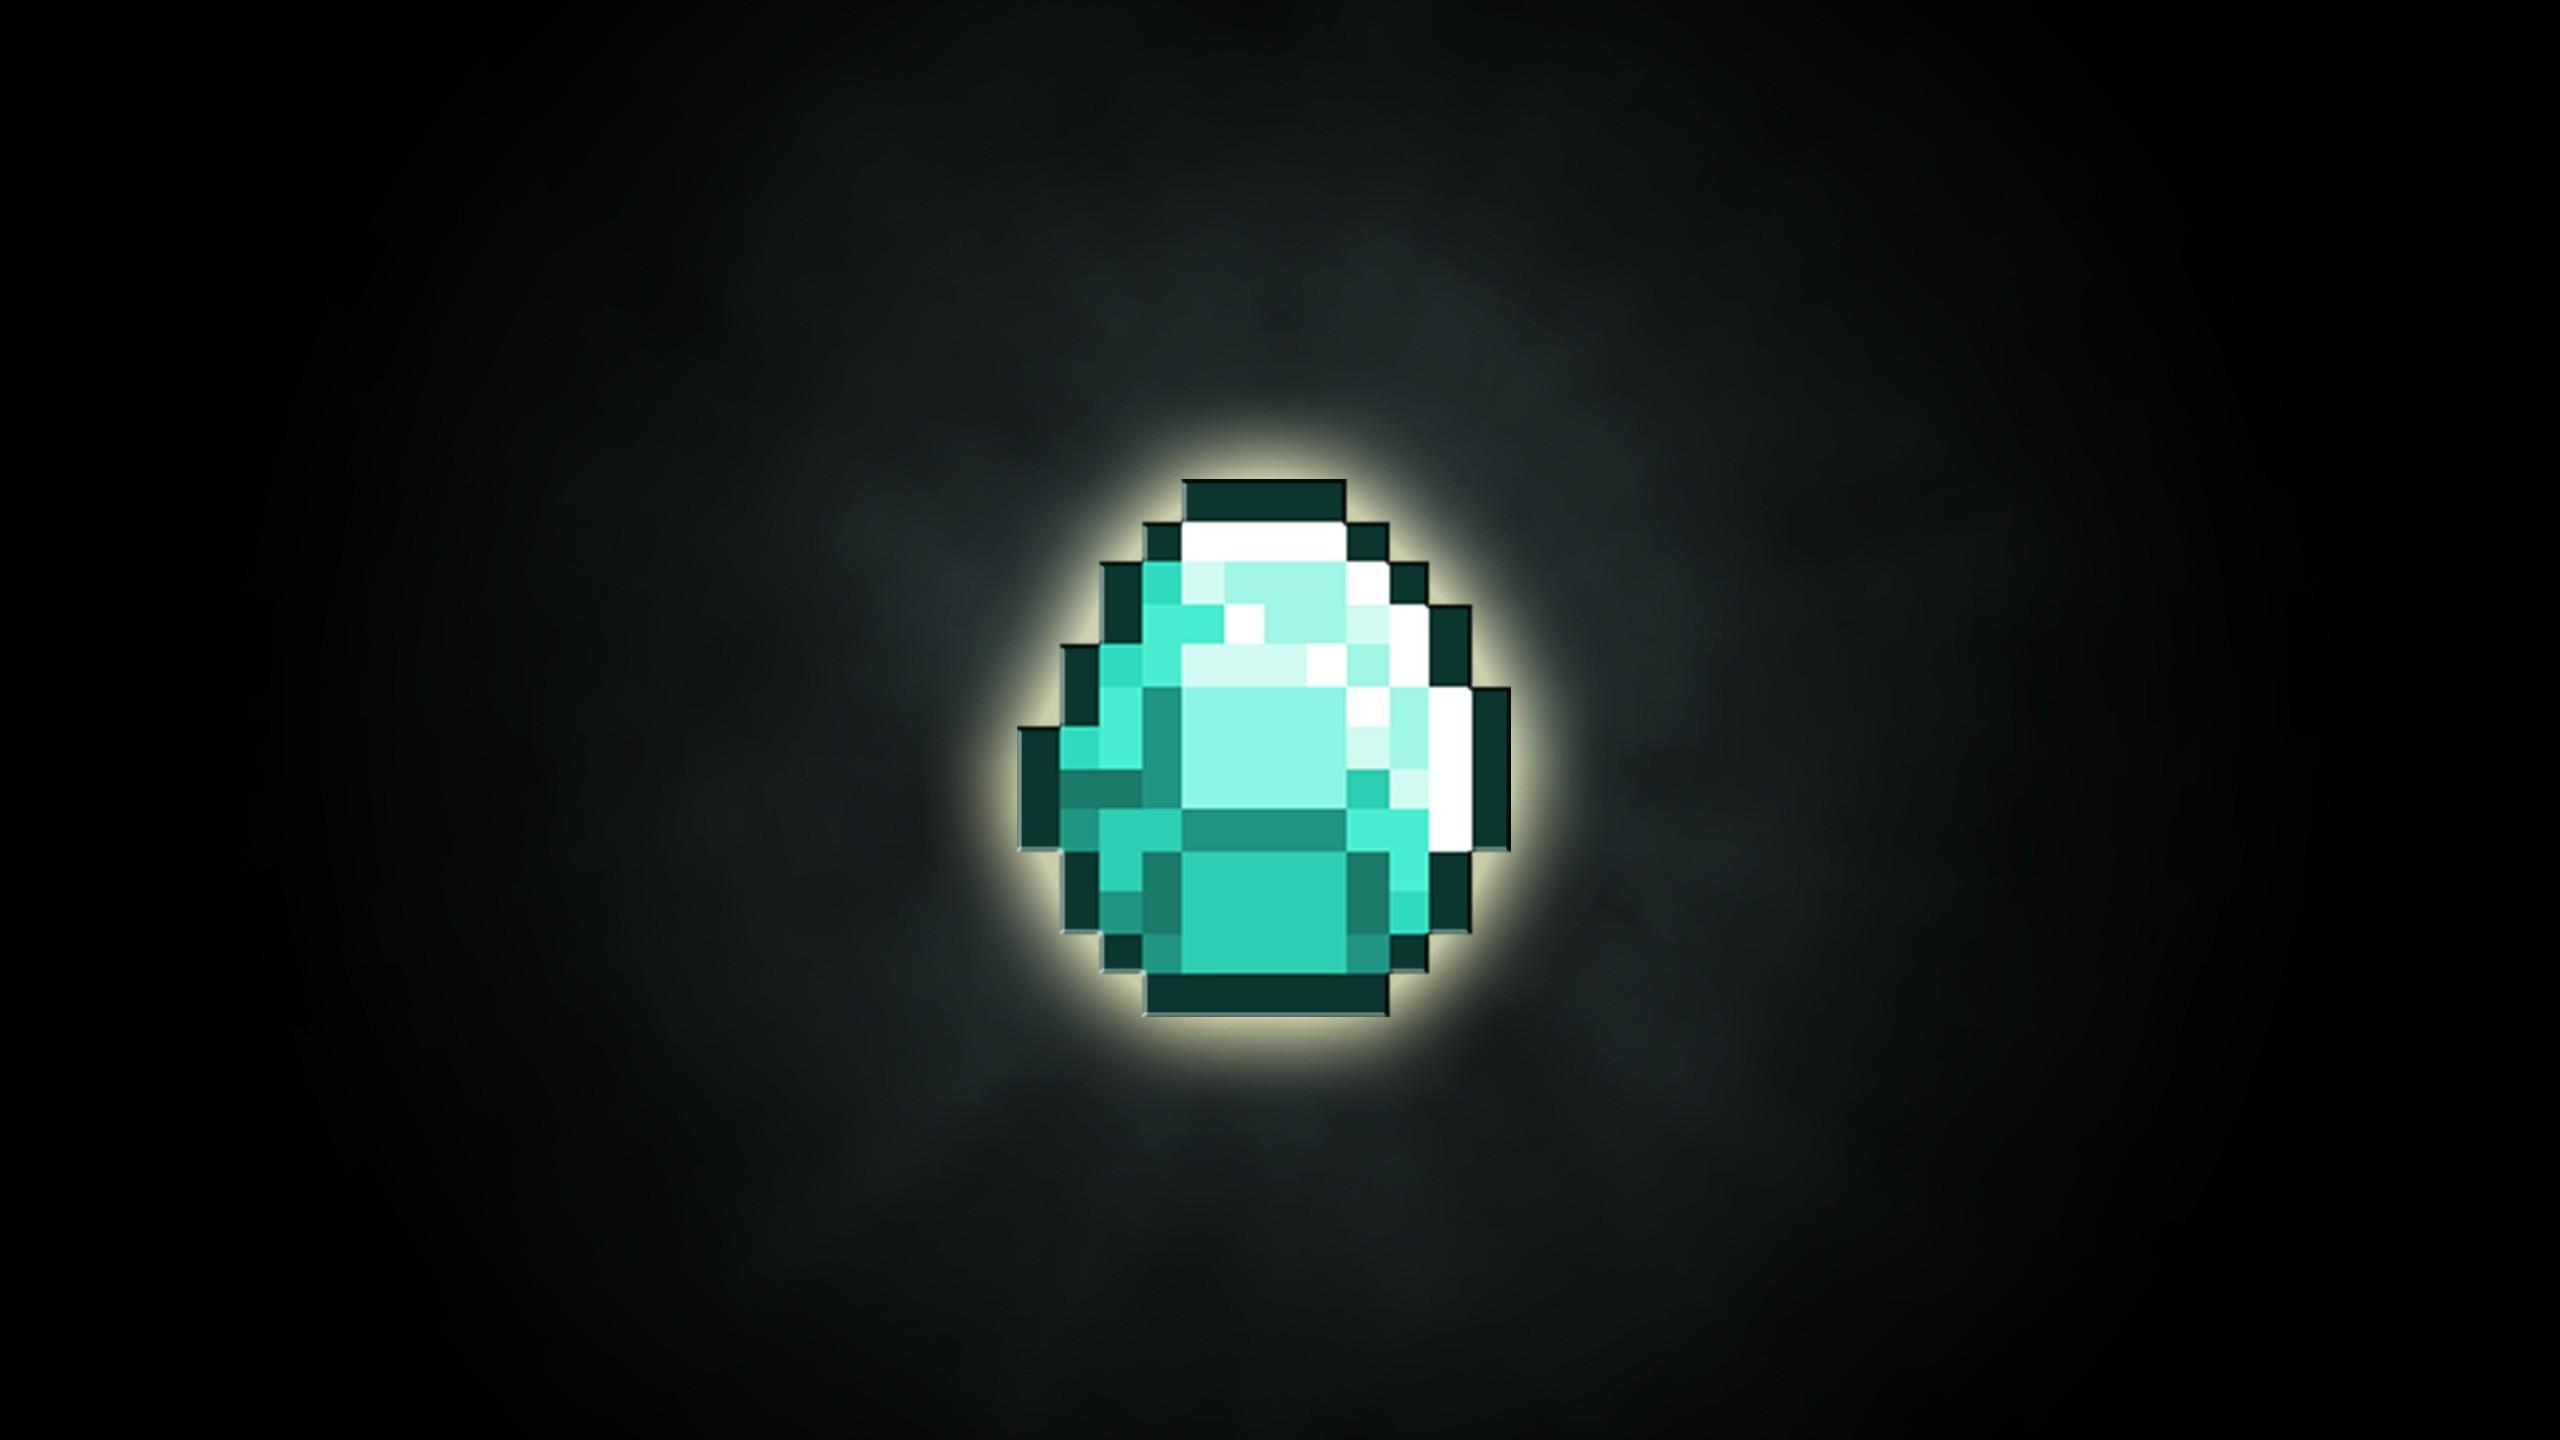 картинки алмазов для майнкрафт стаканчик под ёгурта